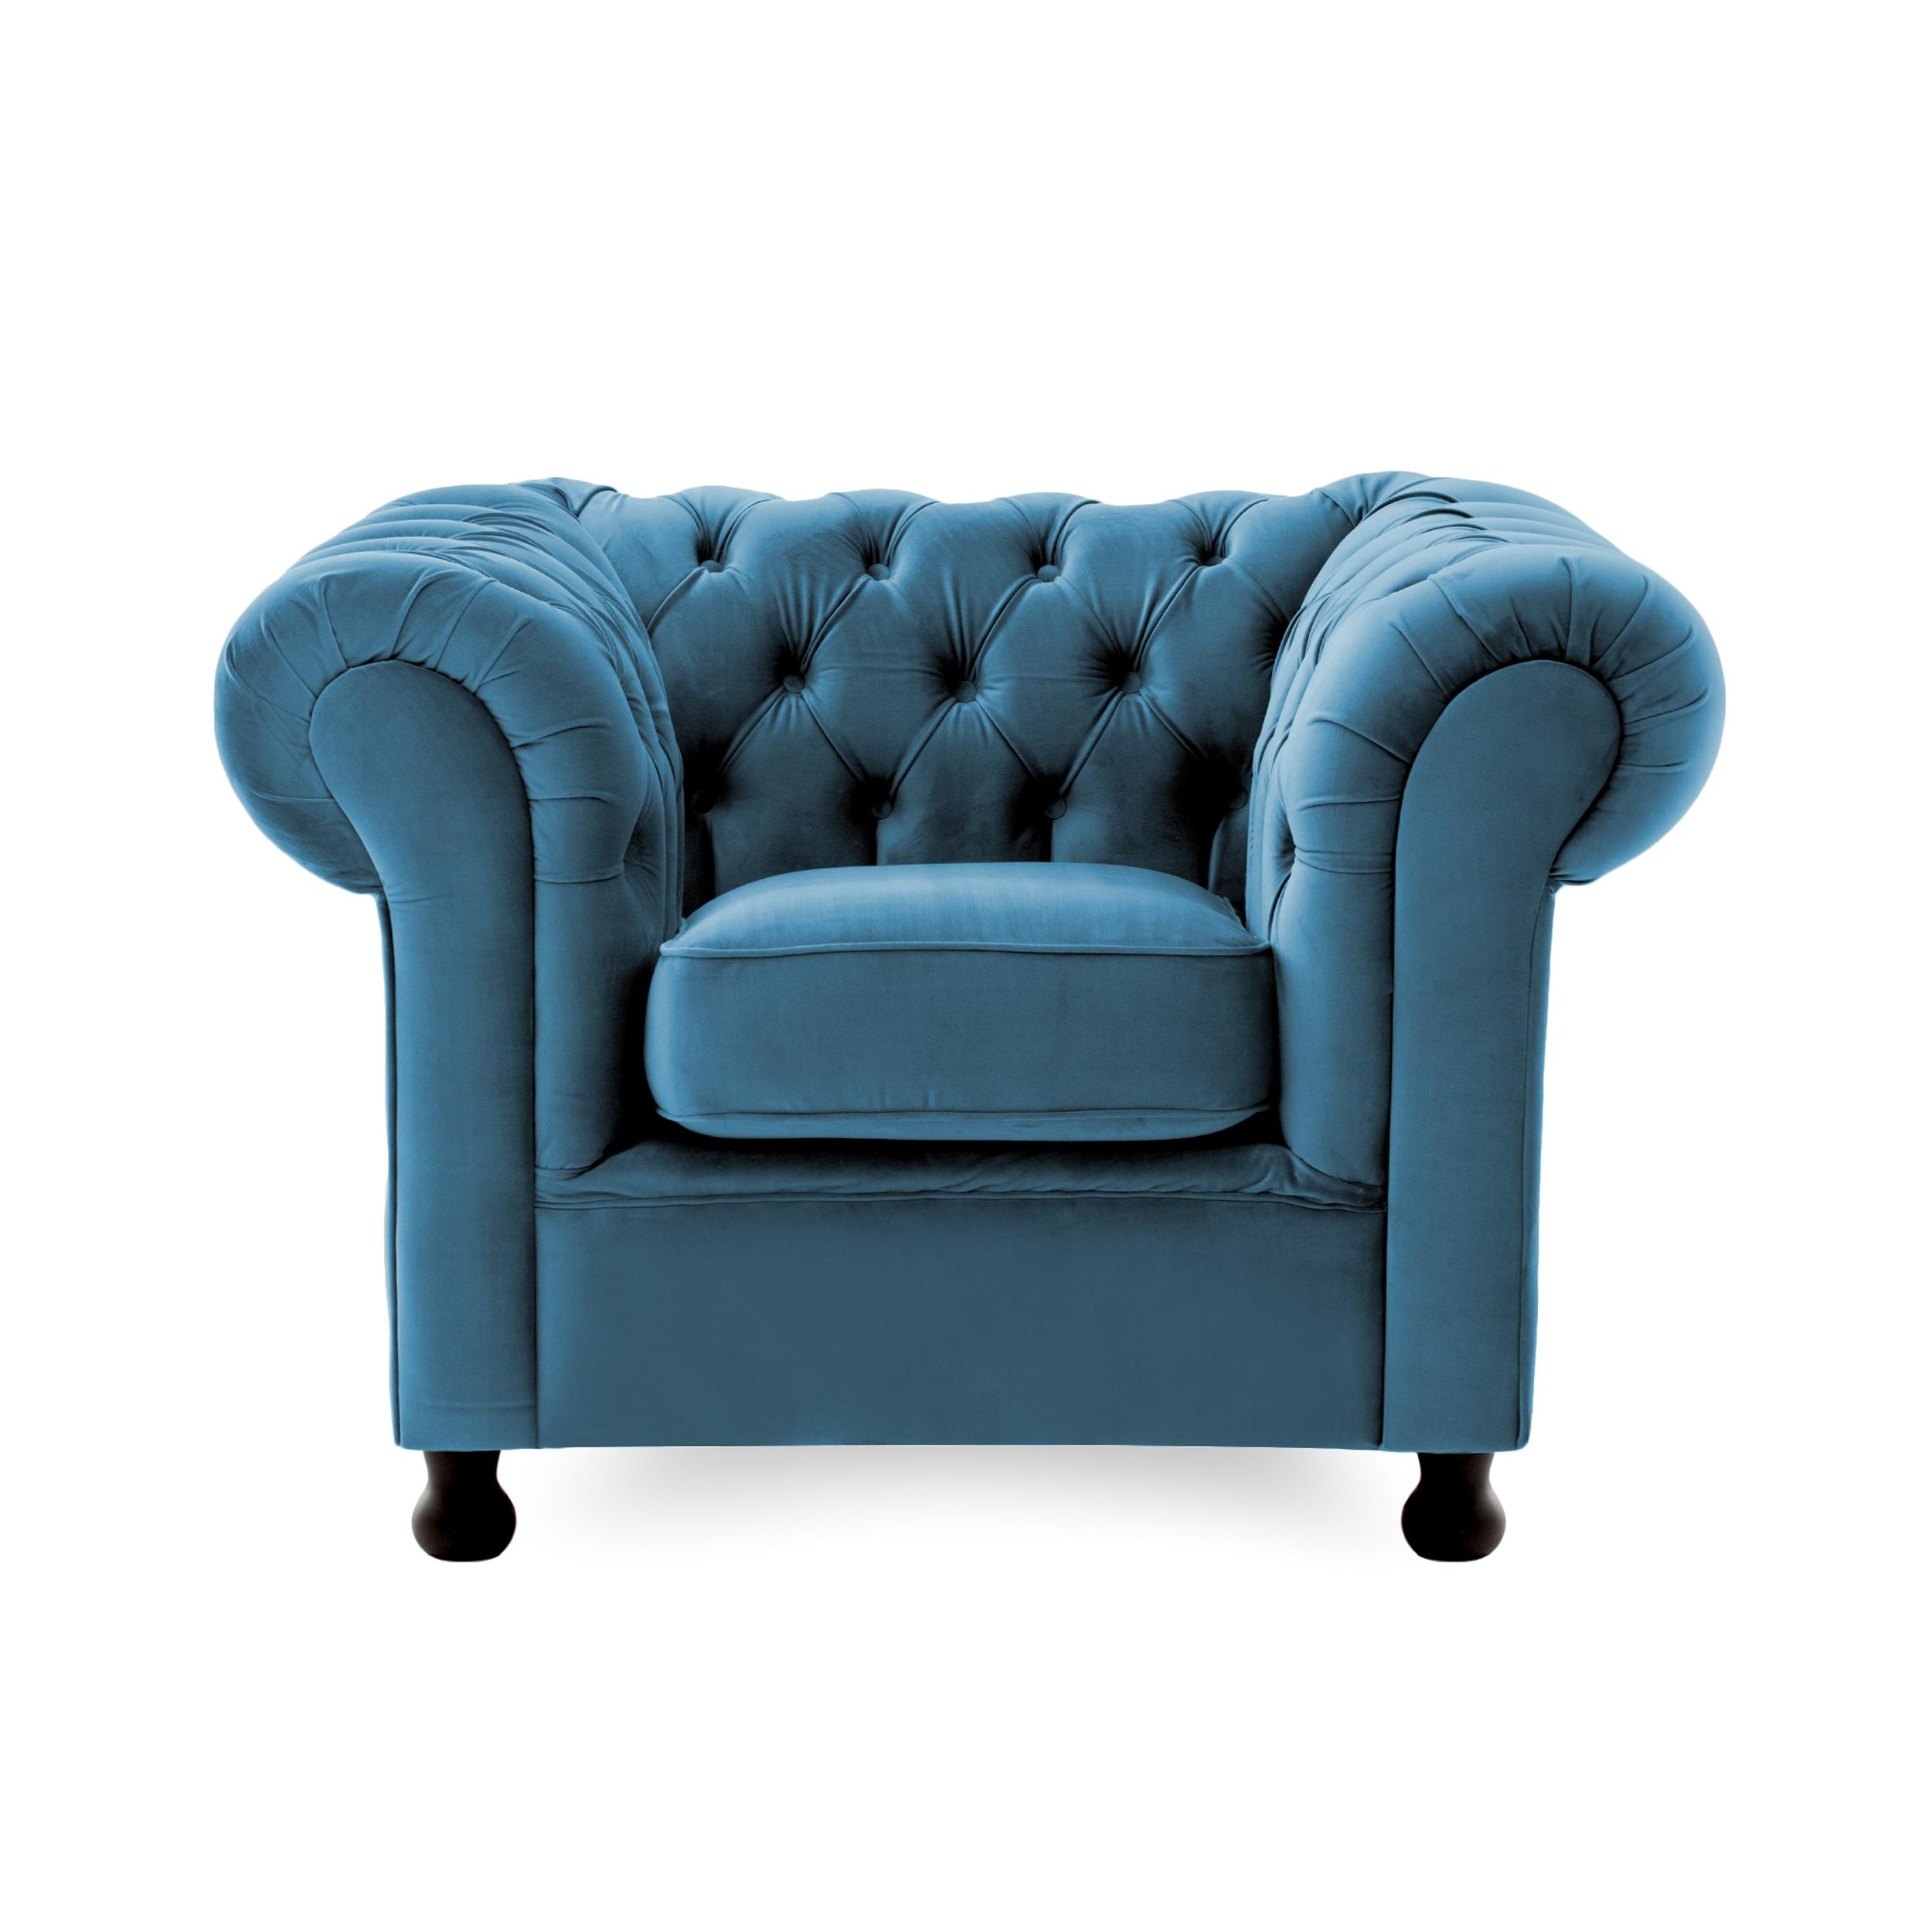 Fotoliu tapitat cu stofa, Chesterfield Albastru, l116xA88xH73 cm